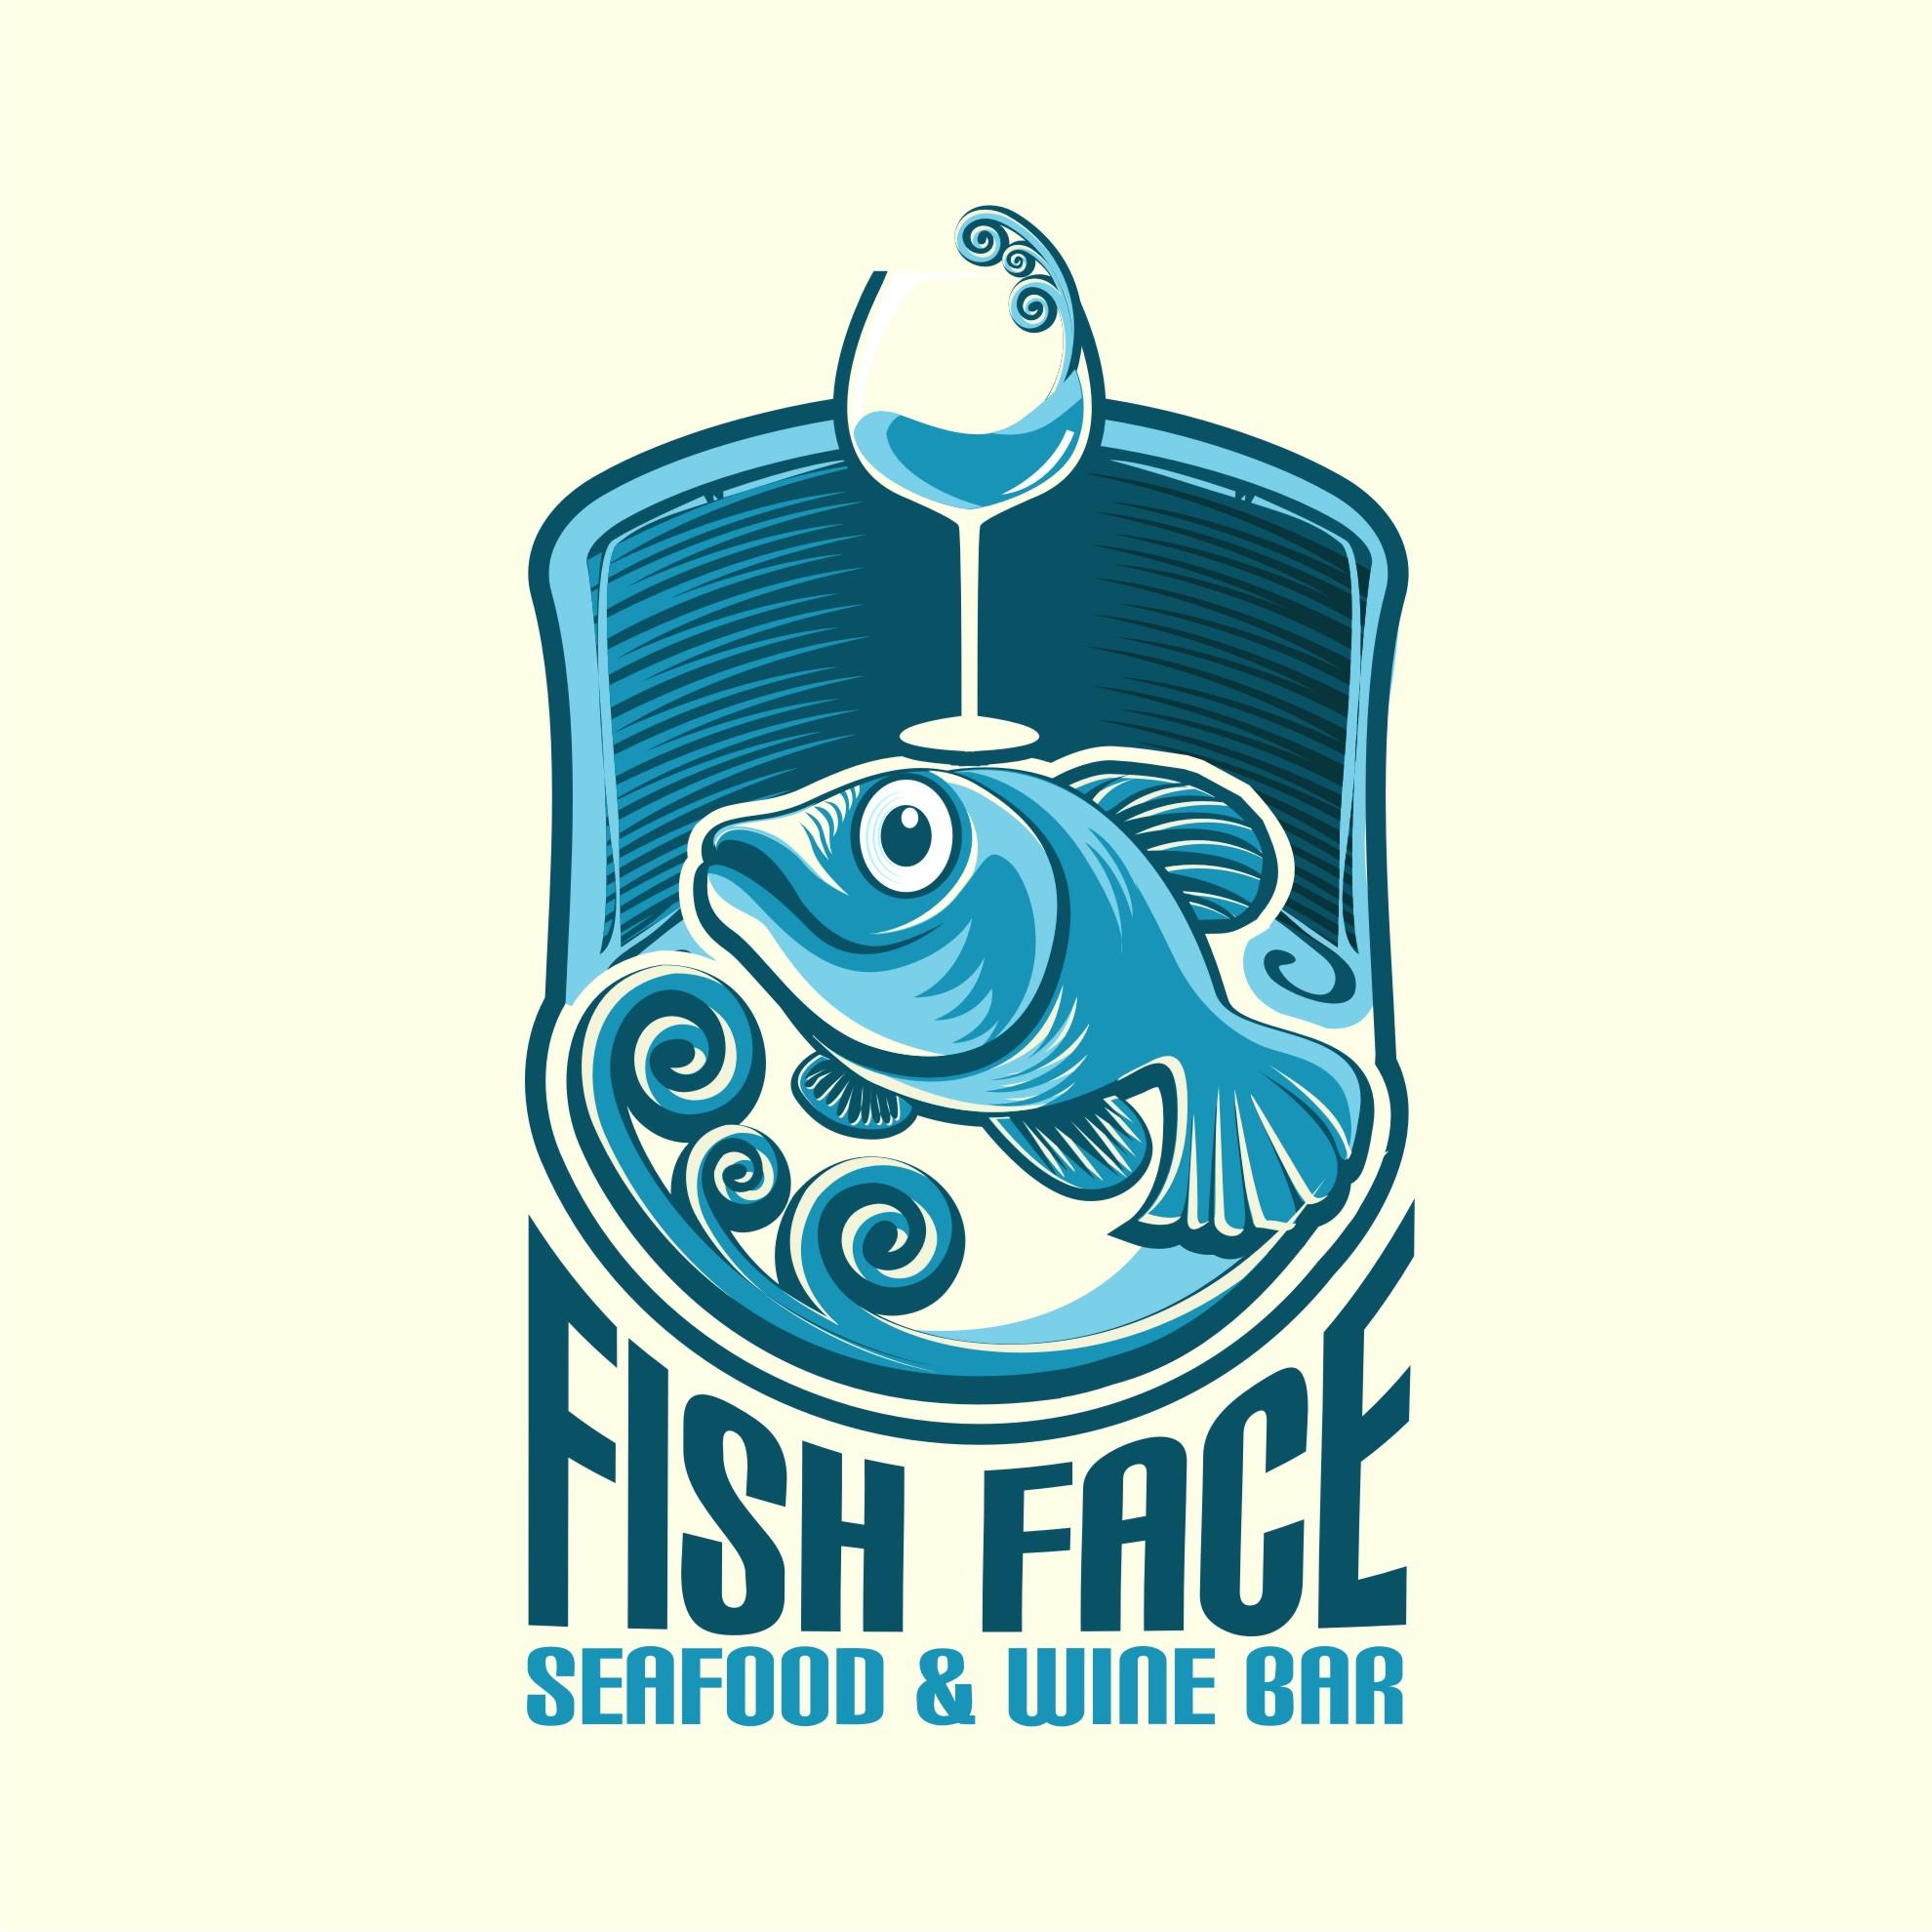 Modern Elegant Seafood Restaurant Logo Design For Fish Face Seafood Wine Bar By Creative Bugs Design 8732330